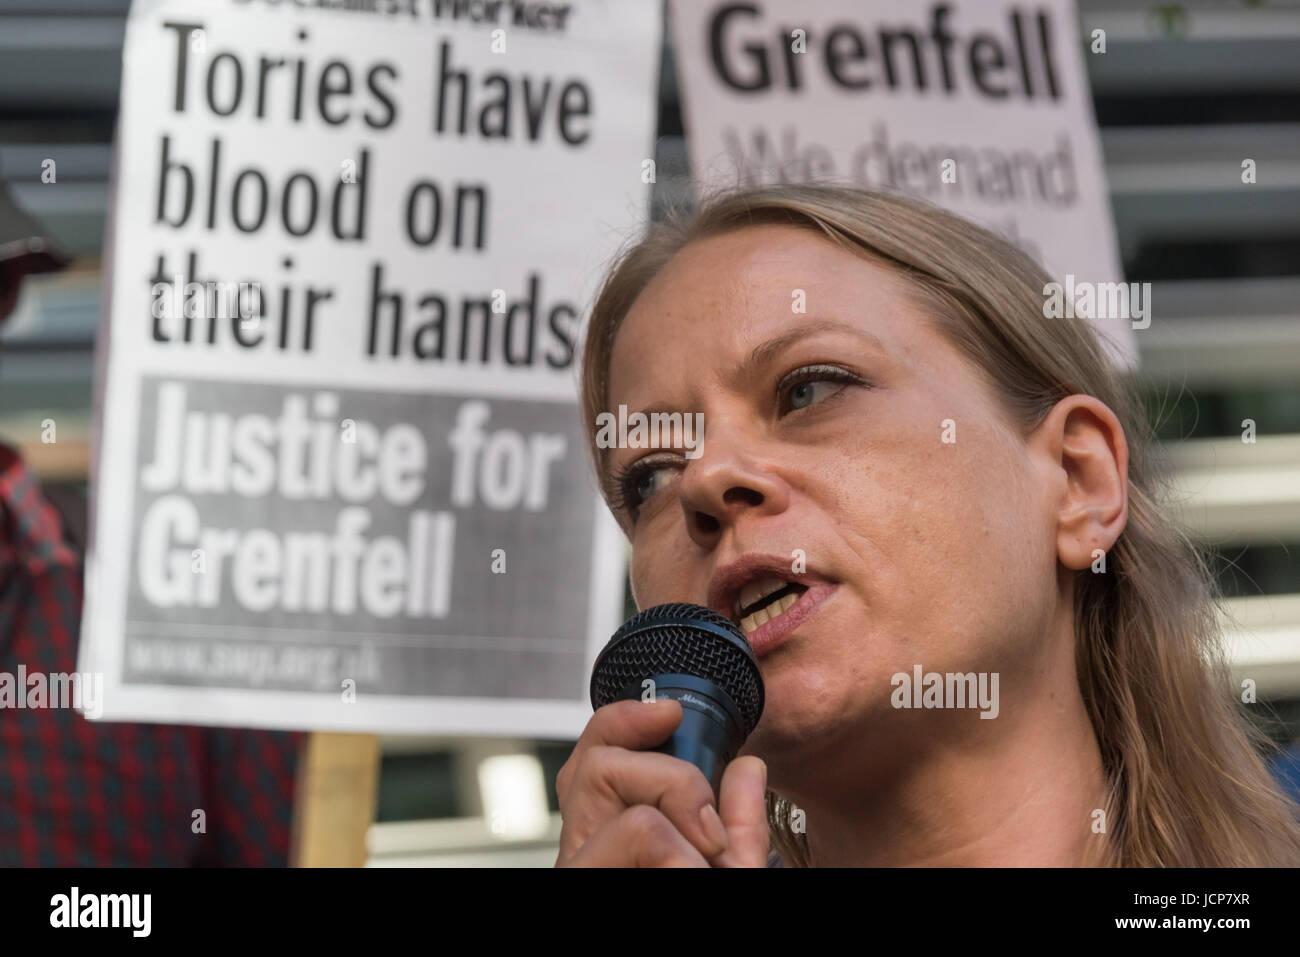 June 16, 2017 - London, UK - London, UK. 16th June 2017. Siân Berry, Green Party London Assembly Member - Stock Image